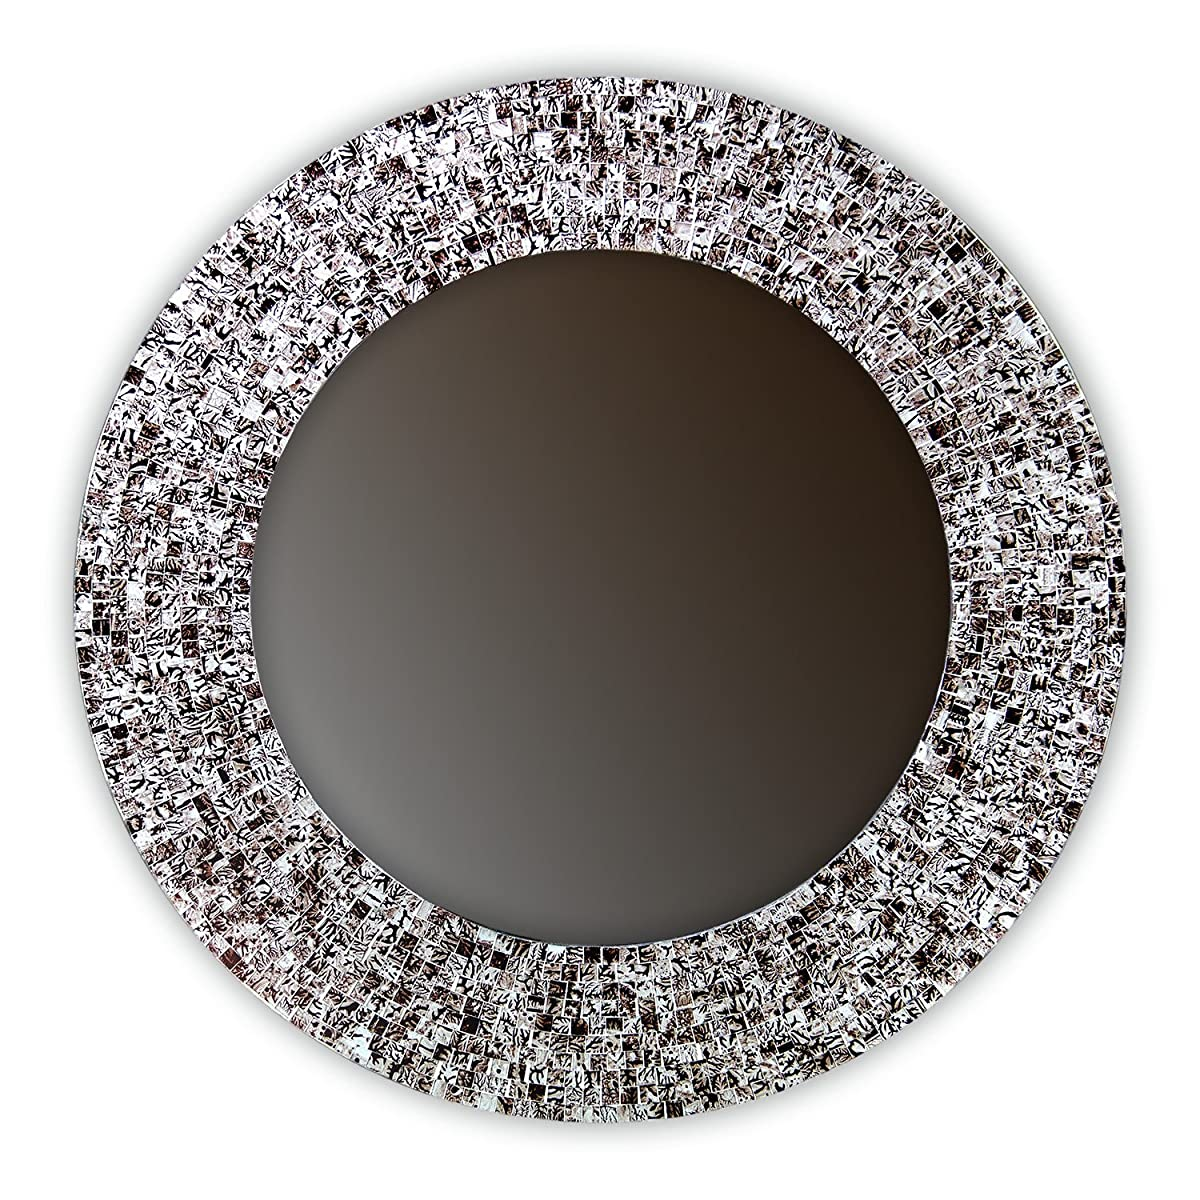 "DecorShore 24"" Iced Coffee, Handmade Wall Mirror, Decorative Glass Mosaic by"